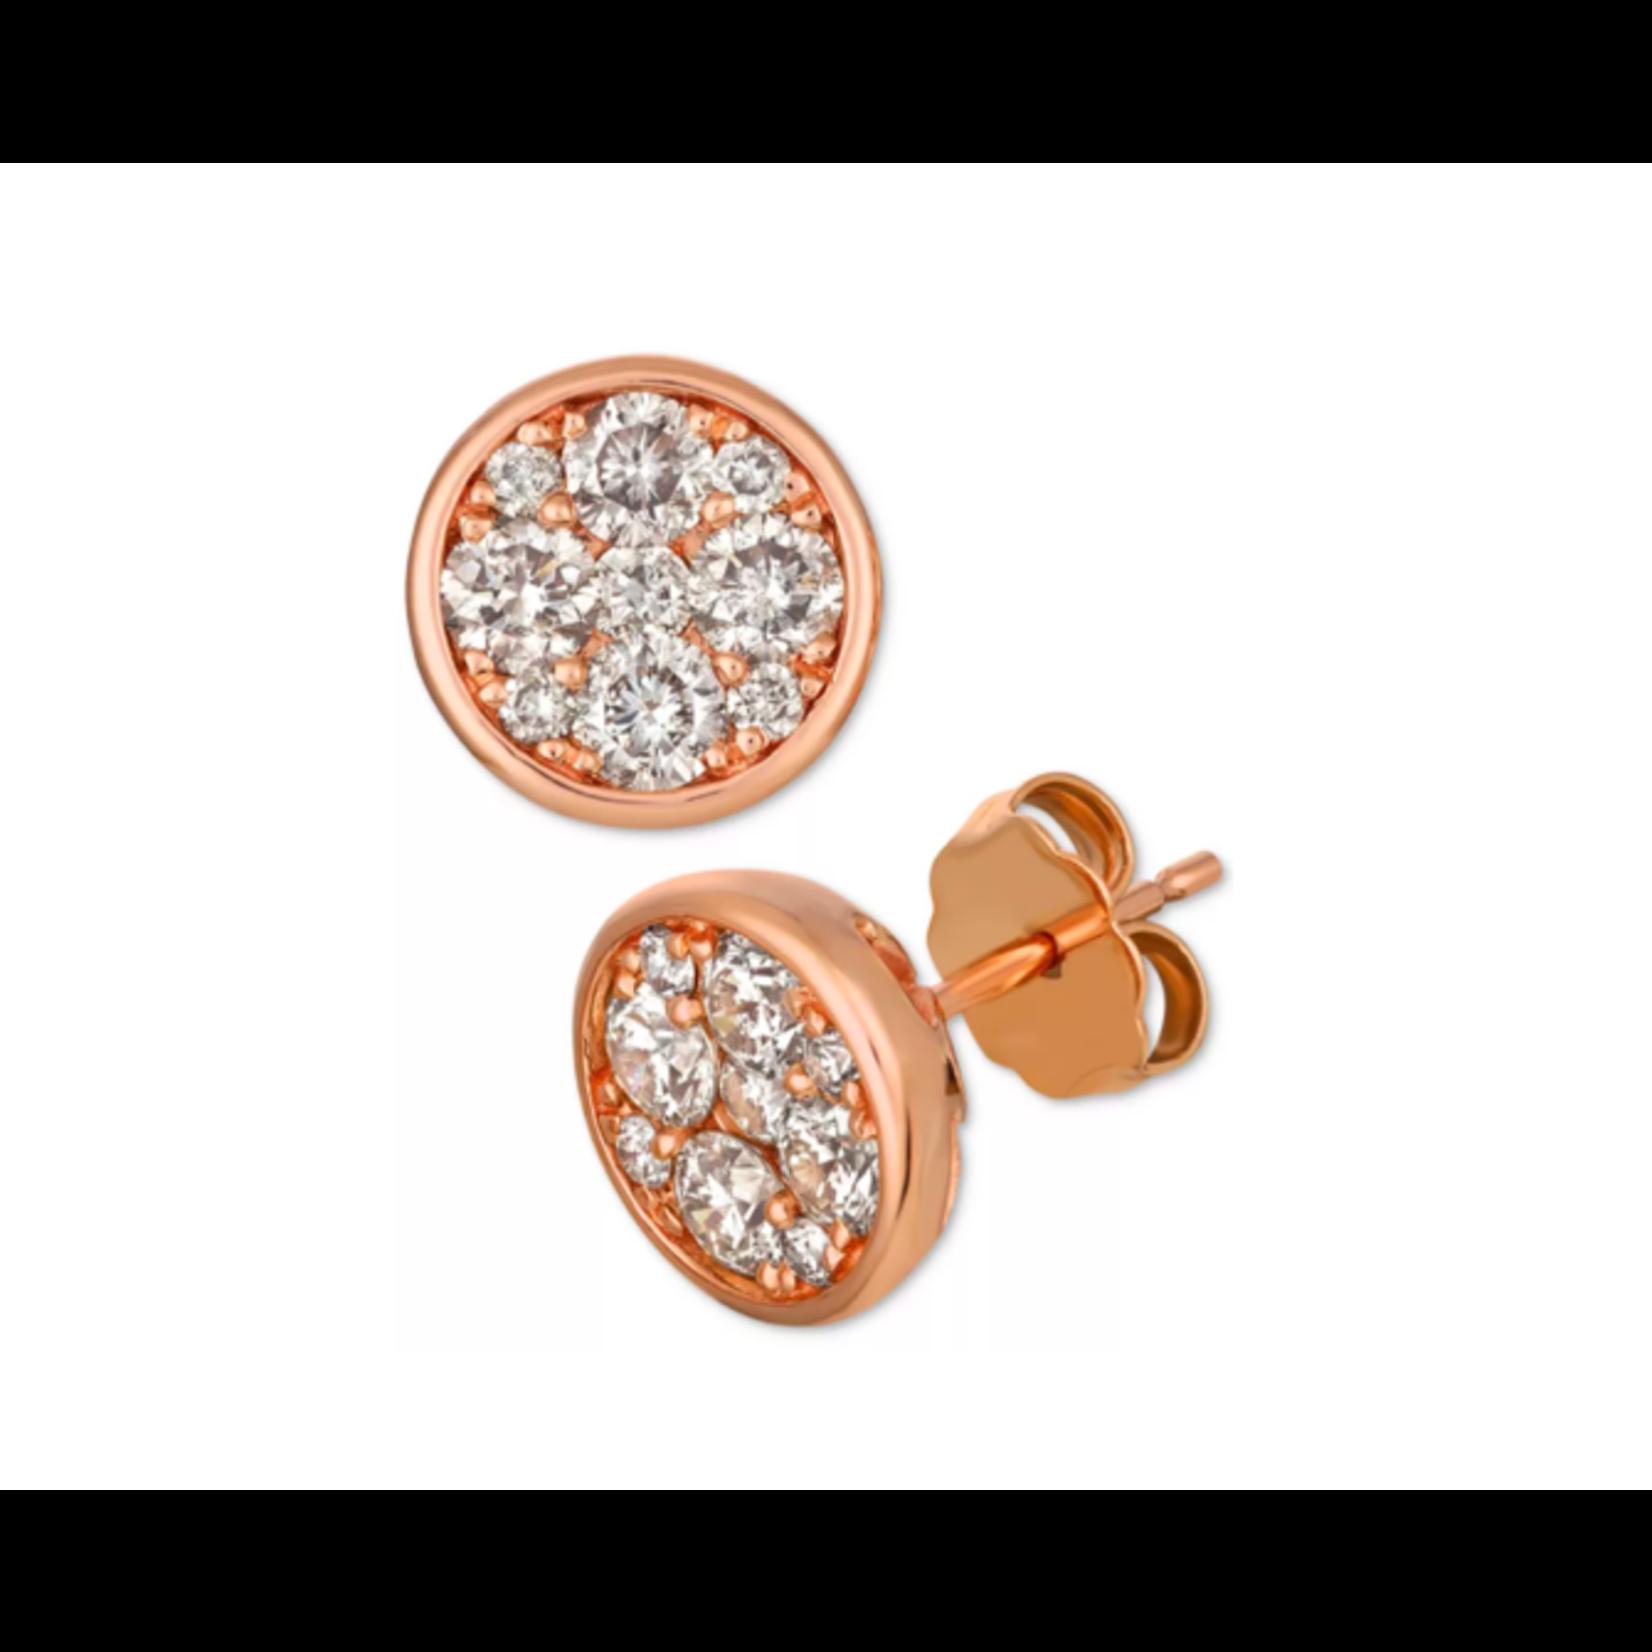 18K Rose Gold Diamond 0.46ctw Round Cluster Stud Earrings